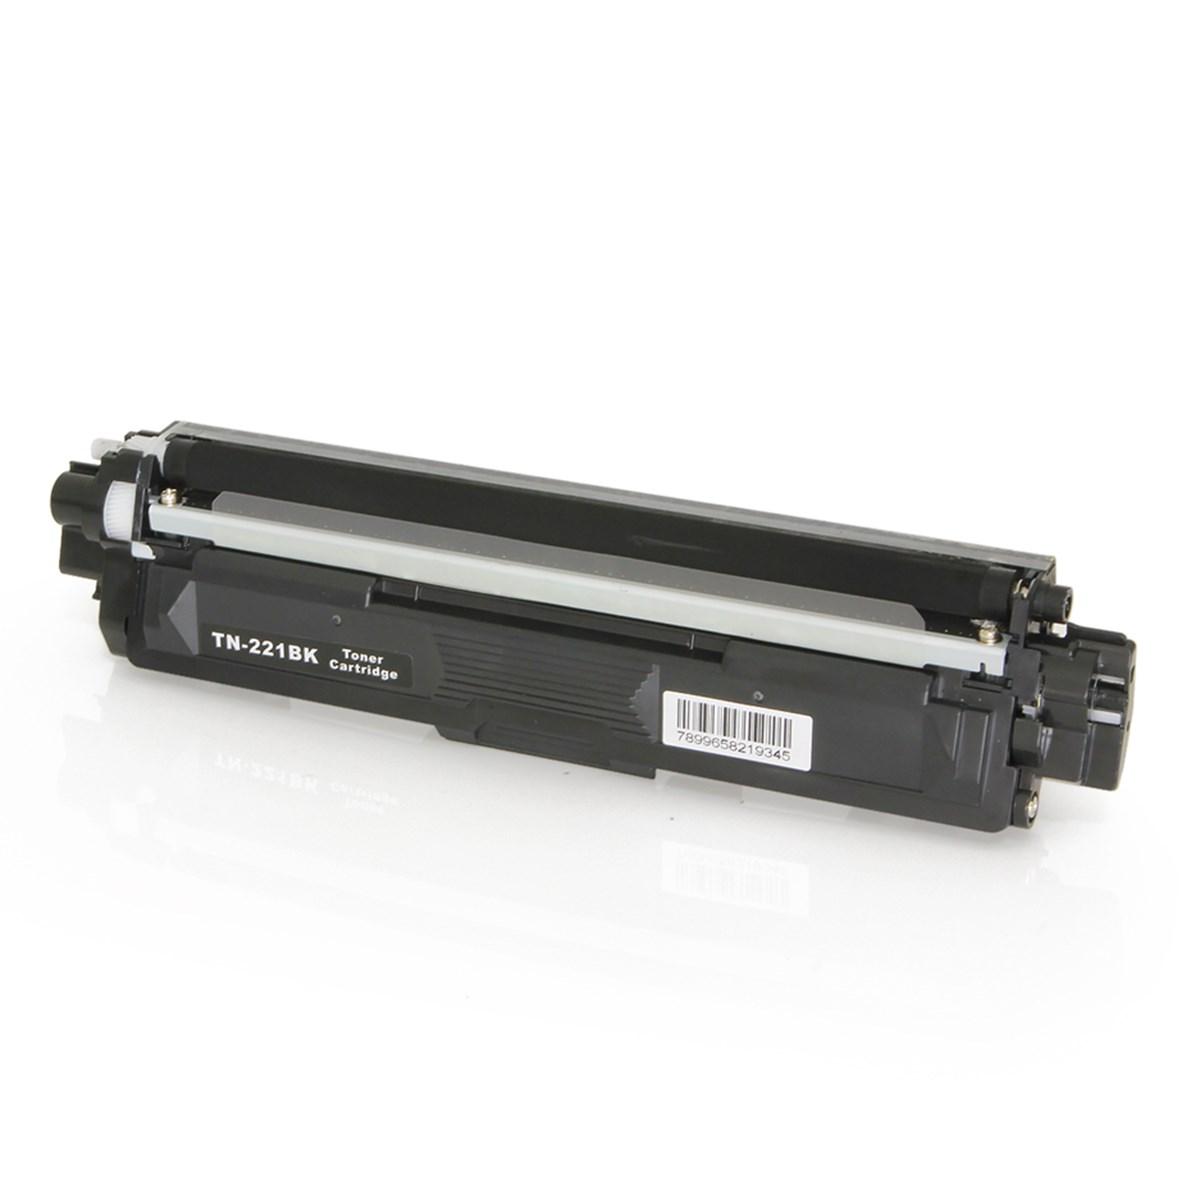 Toner Brother TN-221BK TN221 Preto | HL3140 HL3170 DCP9020 MFC9130 MFC9330 MFC9020 | Premium 2.5k